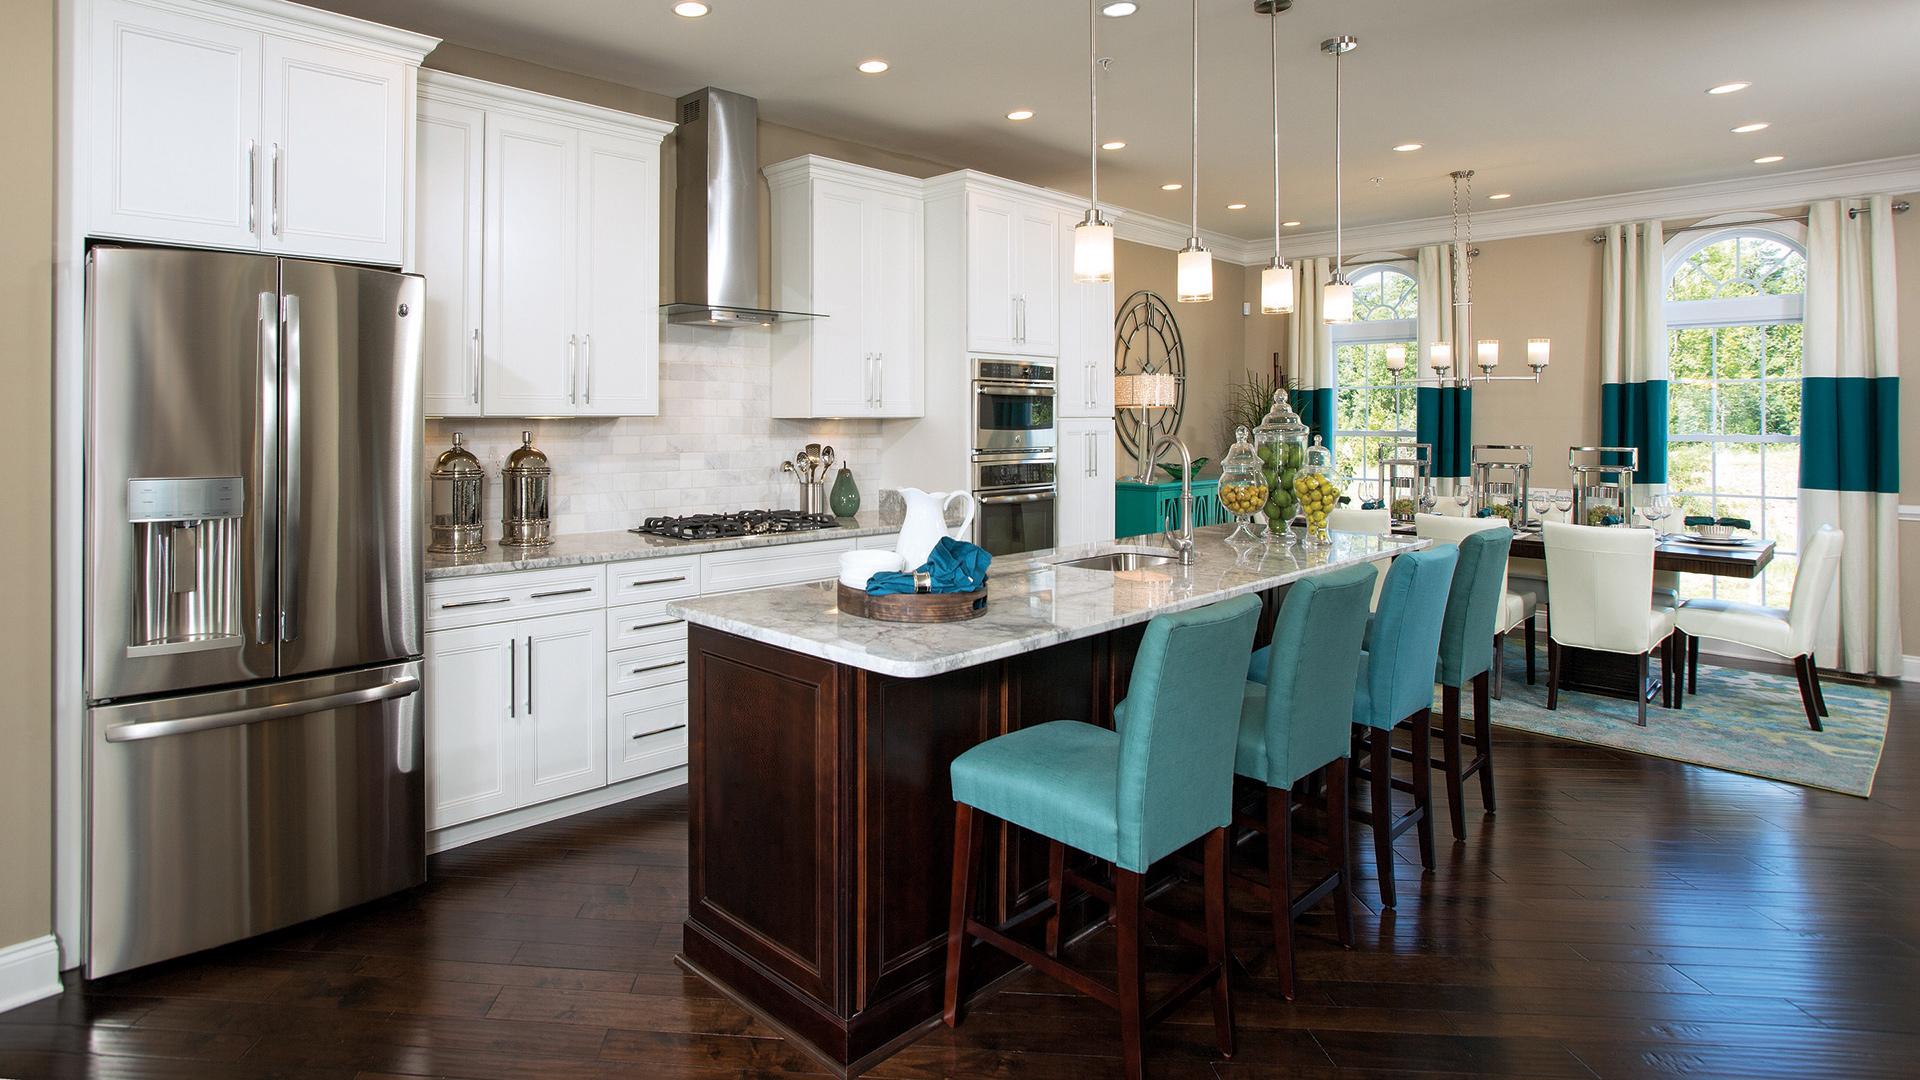 Bethesda Maryland Master Suite Remodeling: The Enclave At ArundelPreserve - Townhomes